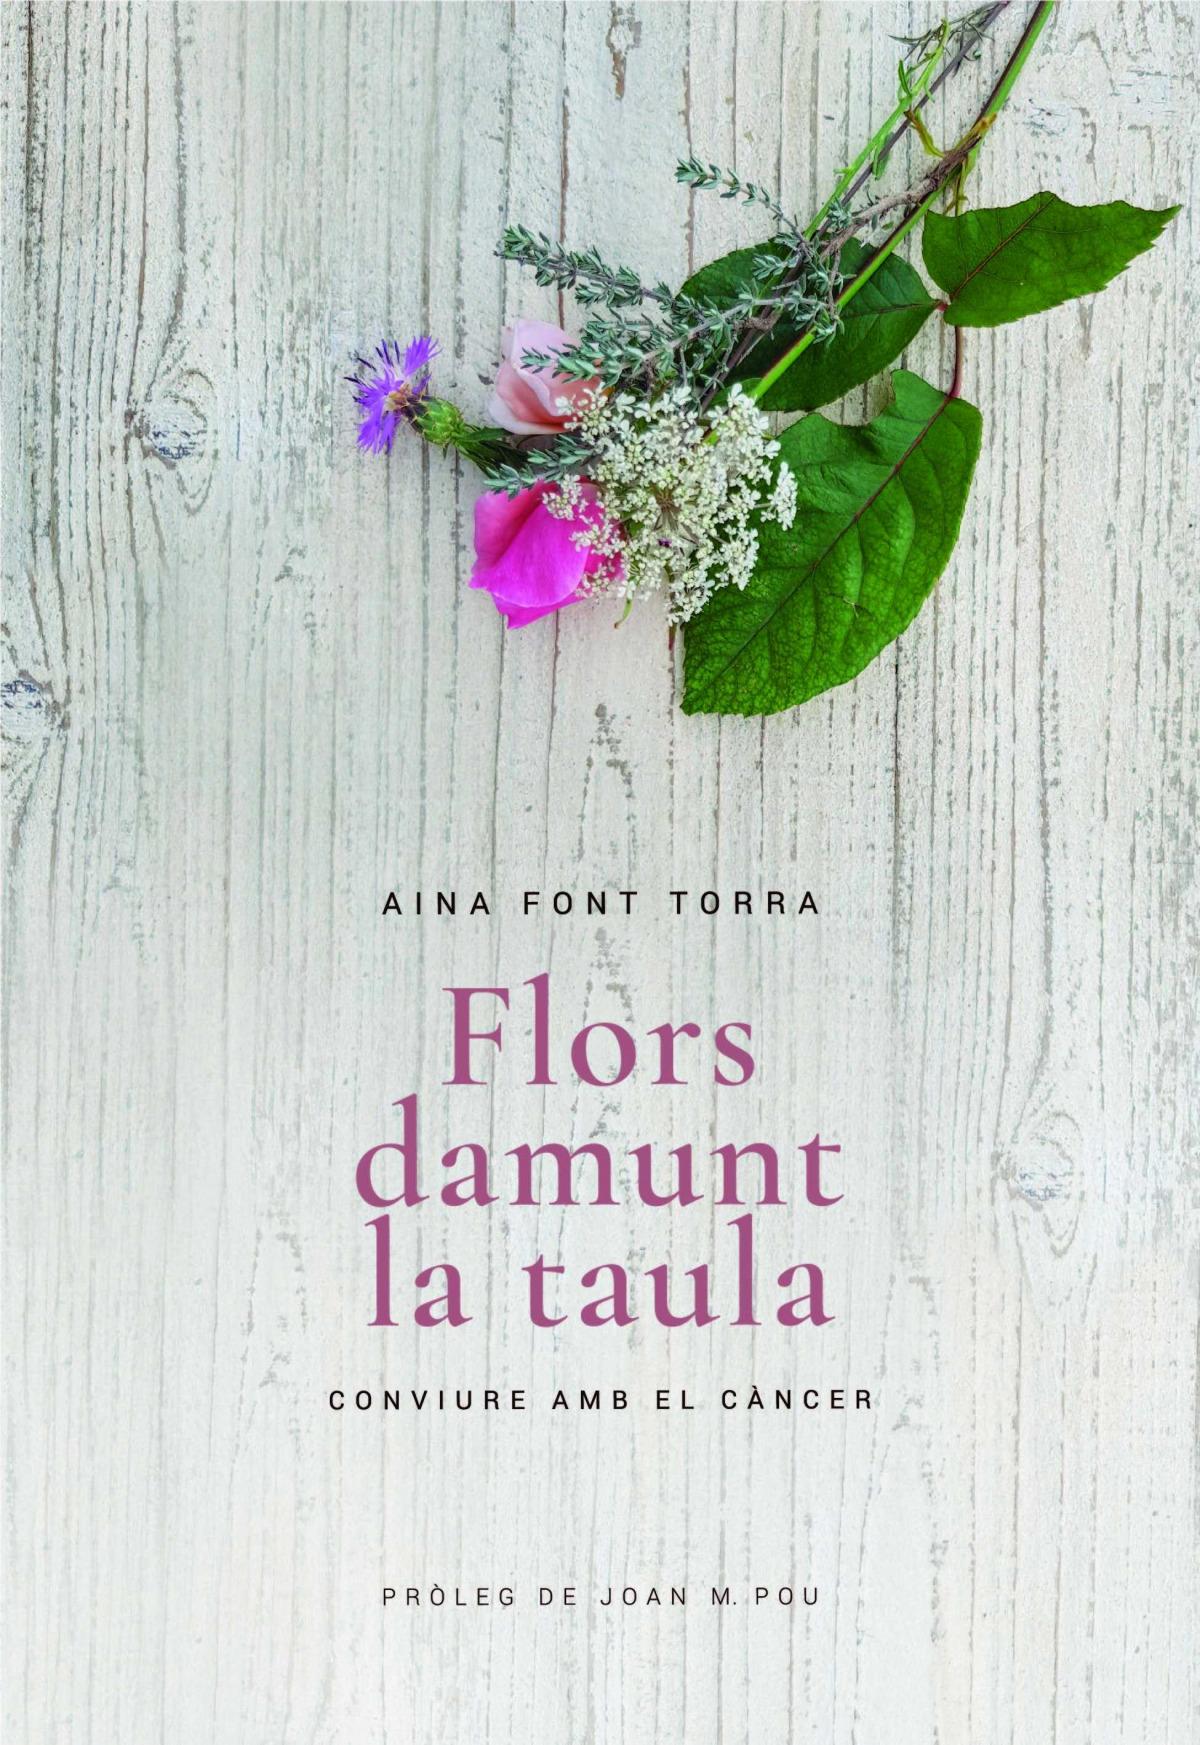 FLORS DAMUNT LA TAULA